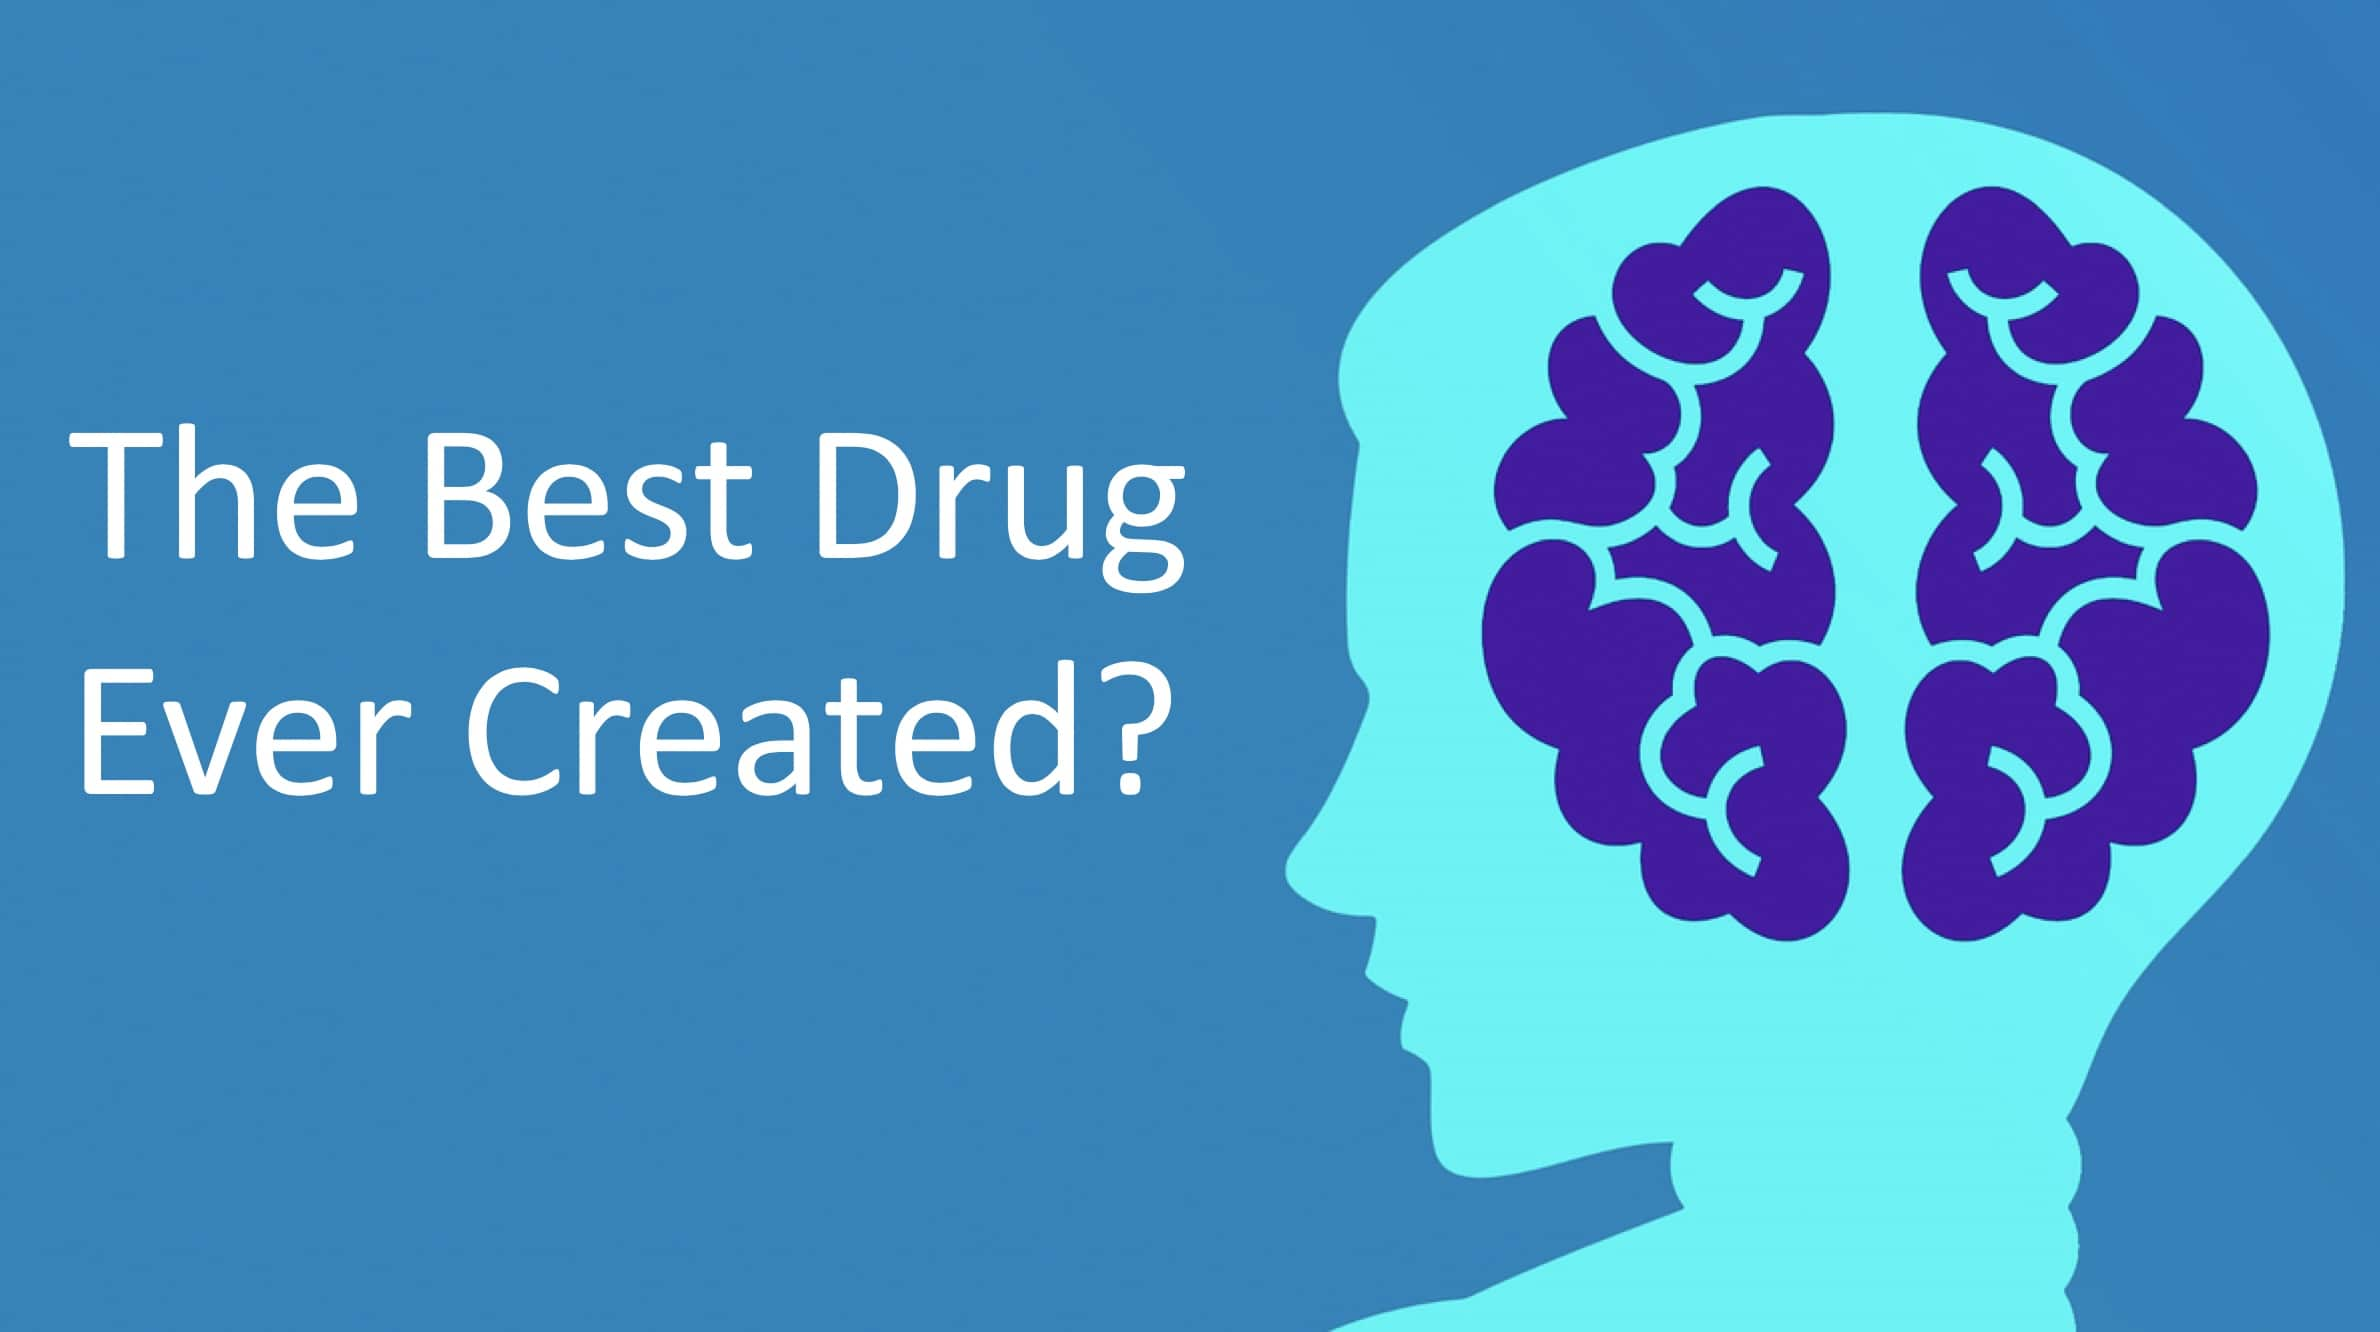 dopamine-drug-alcohol-addiction-treatment-Texas-rehab-detox